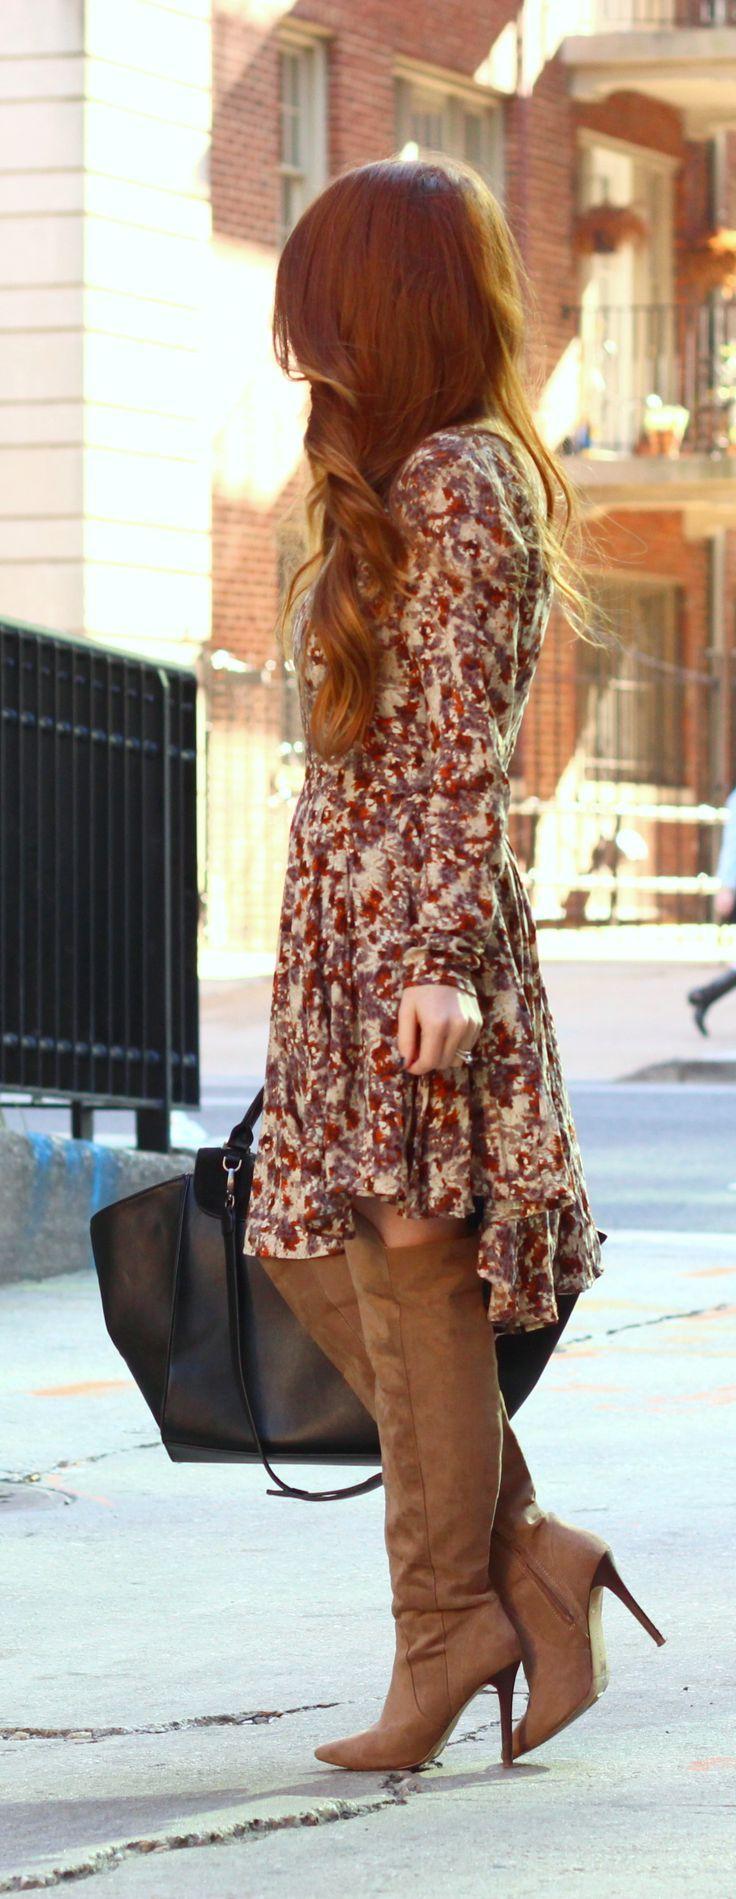 Boho-Kleid + Overknee-Stiefel | Outfit ideen, Boho ...